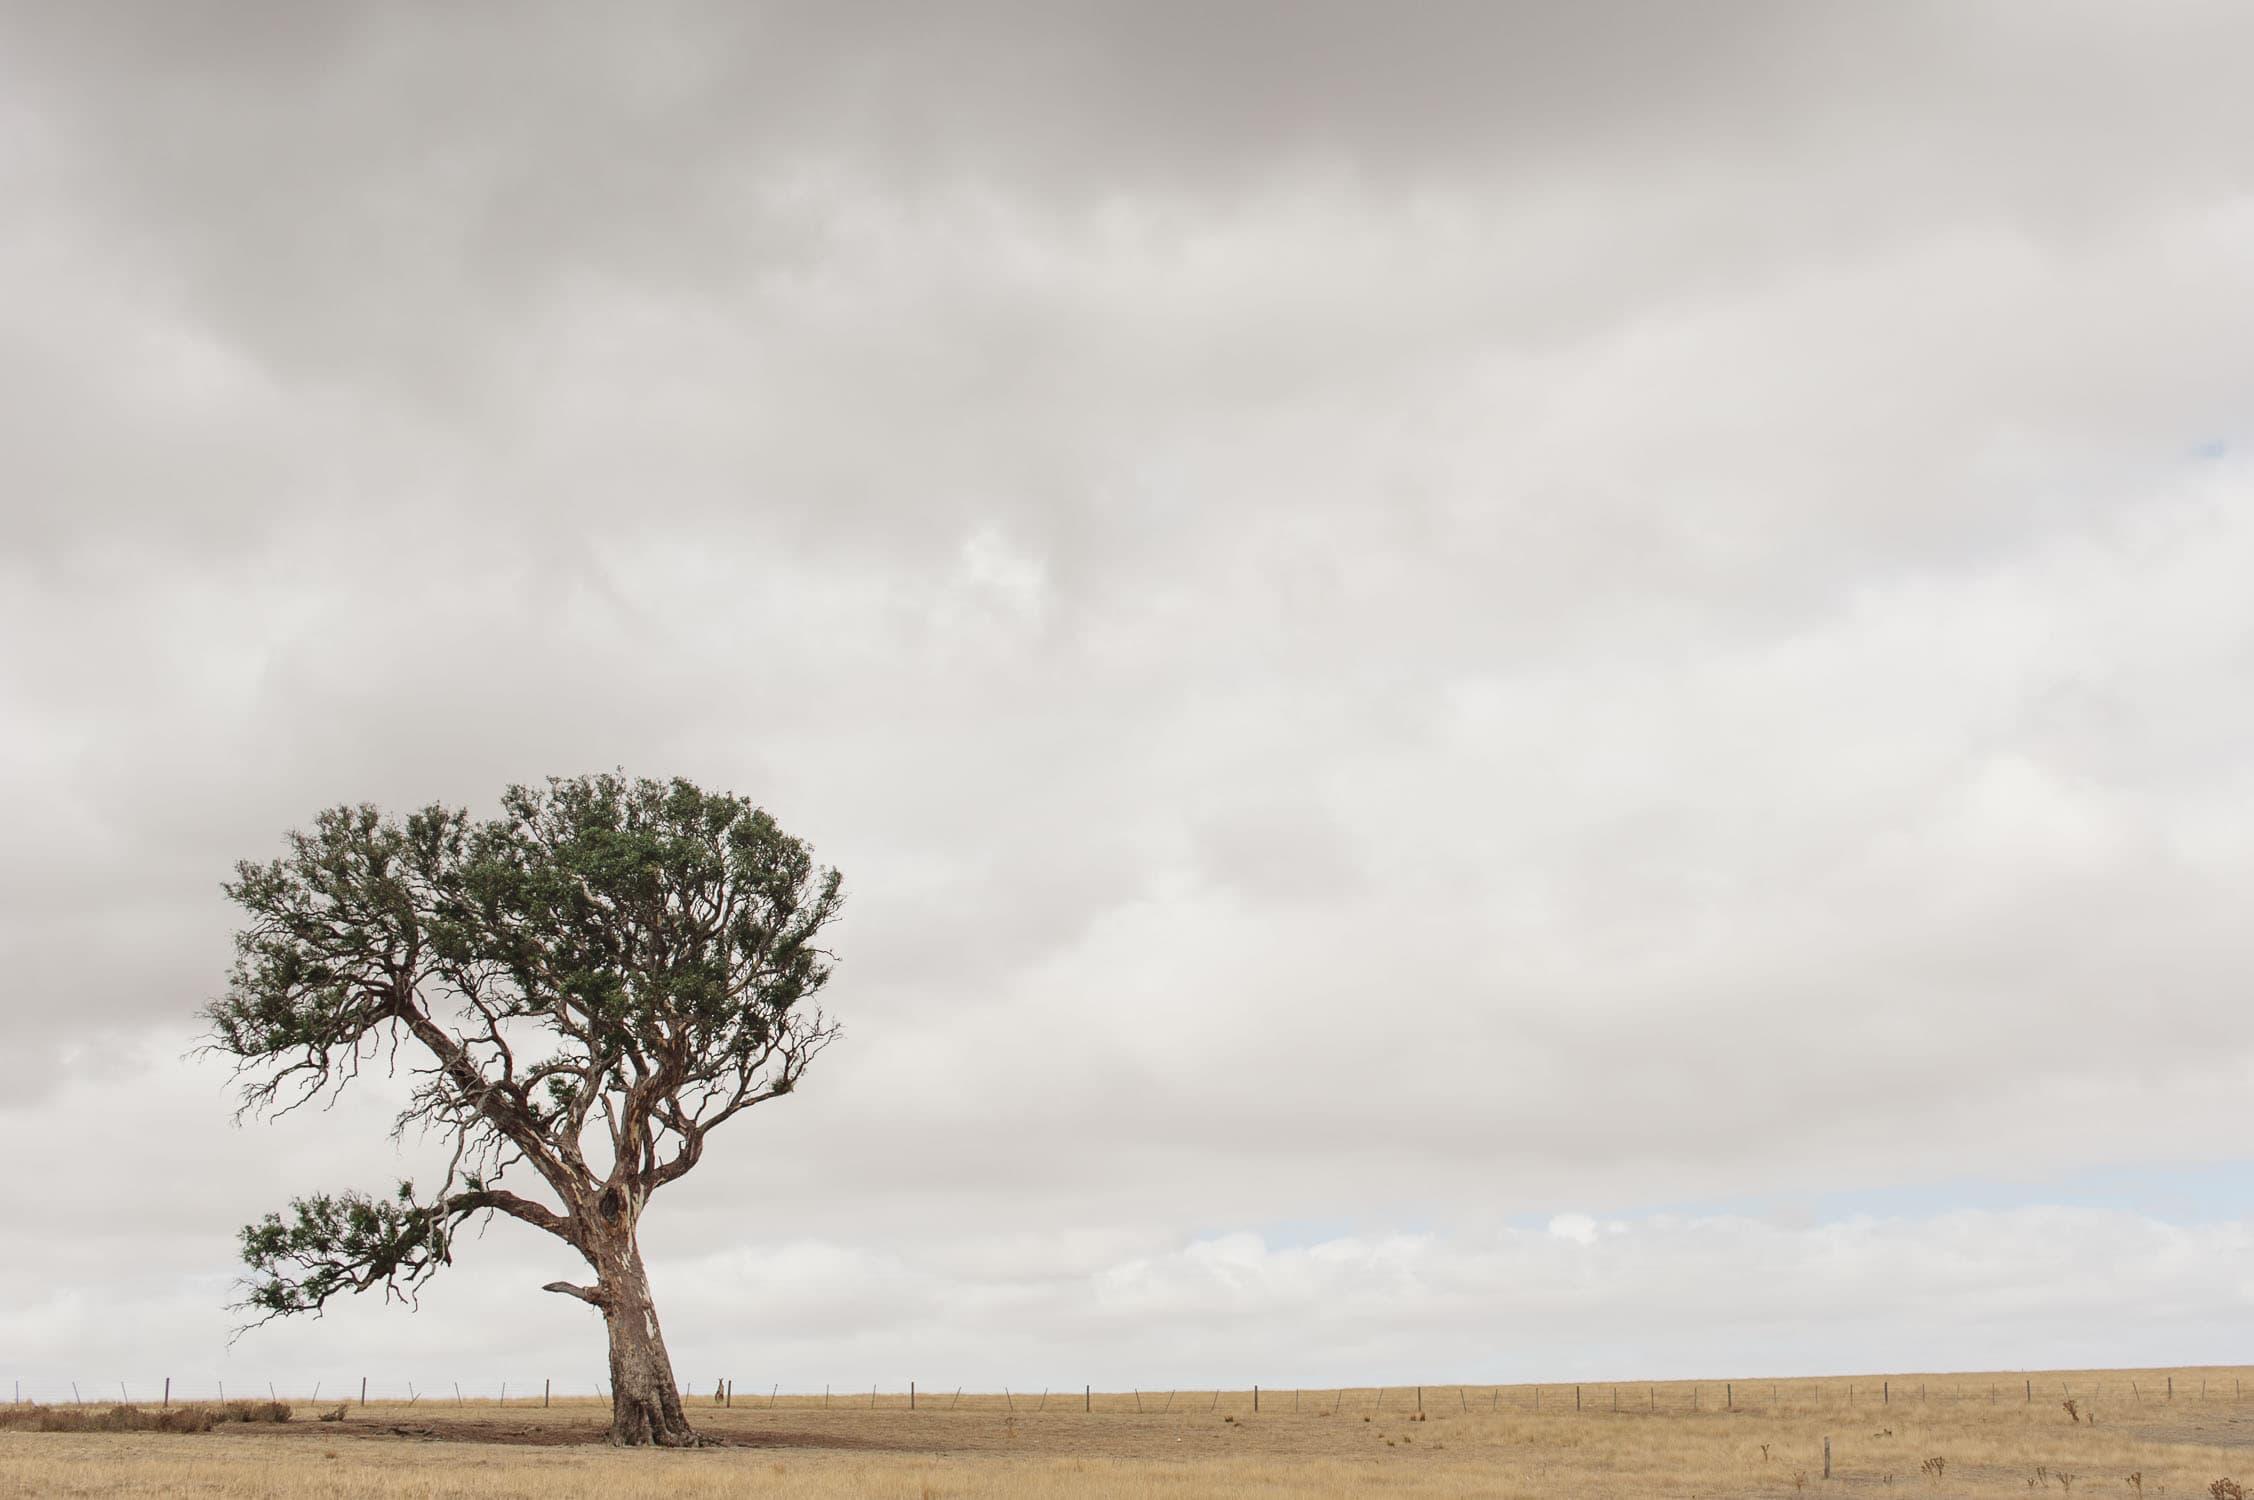 Lone tree on the horizon near Dunkeld